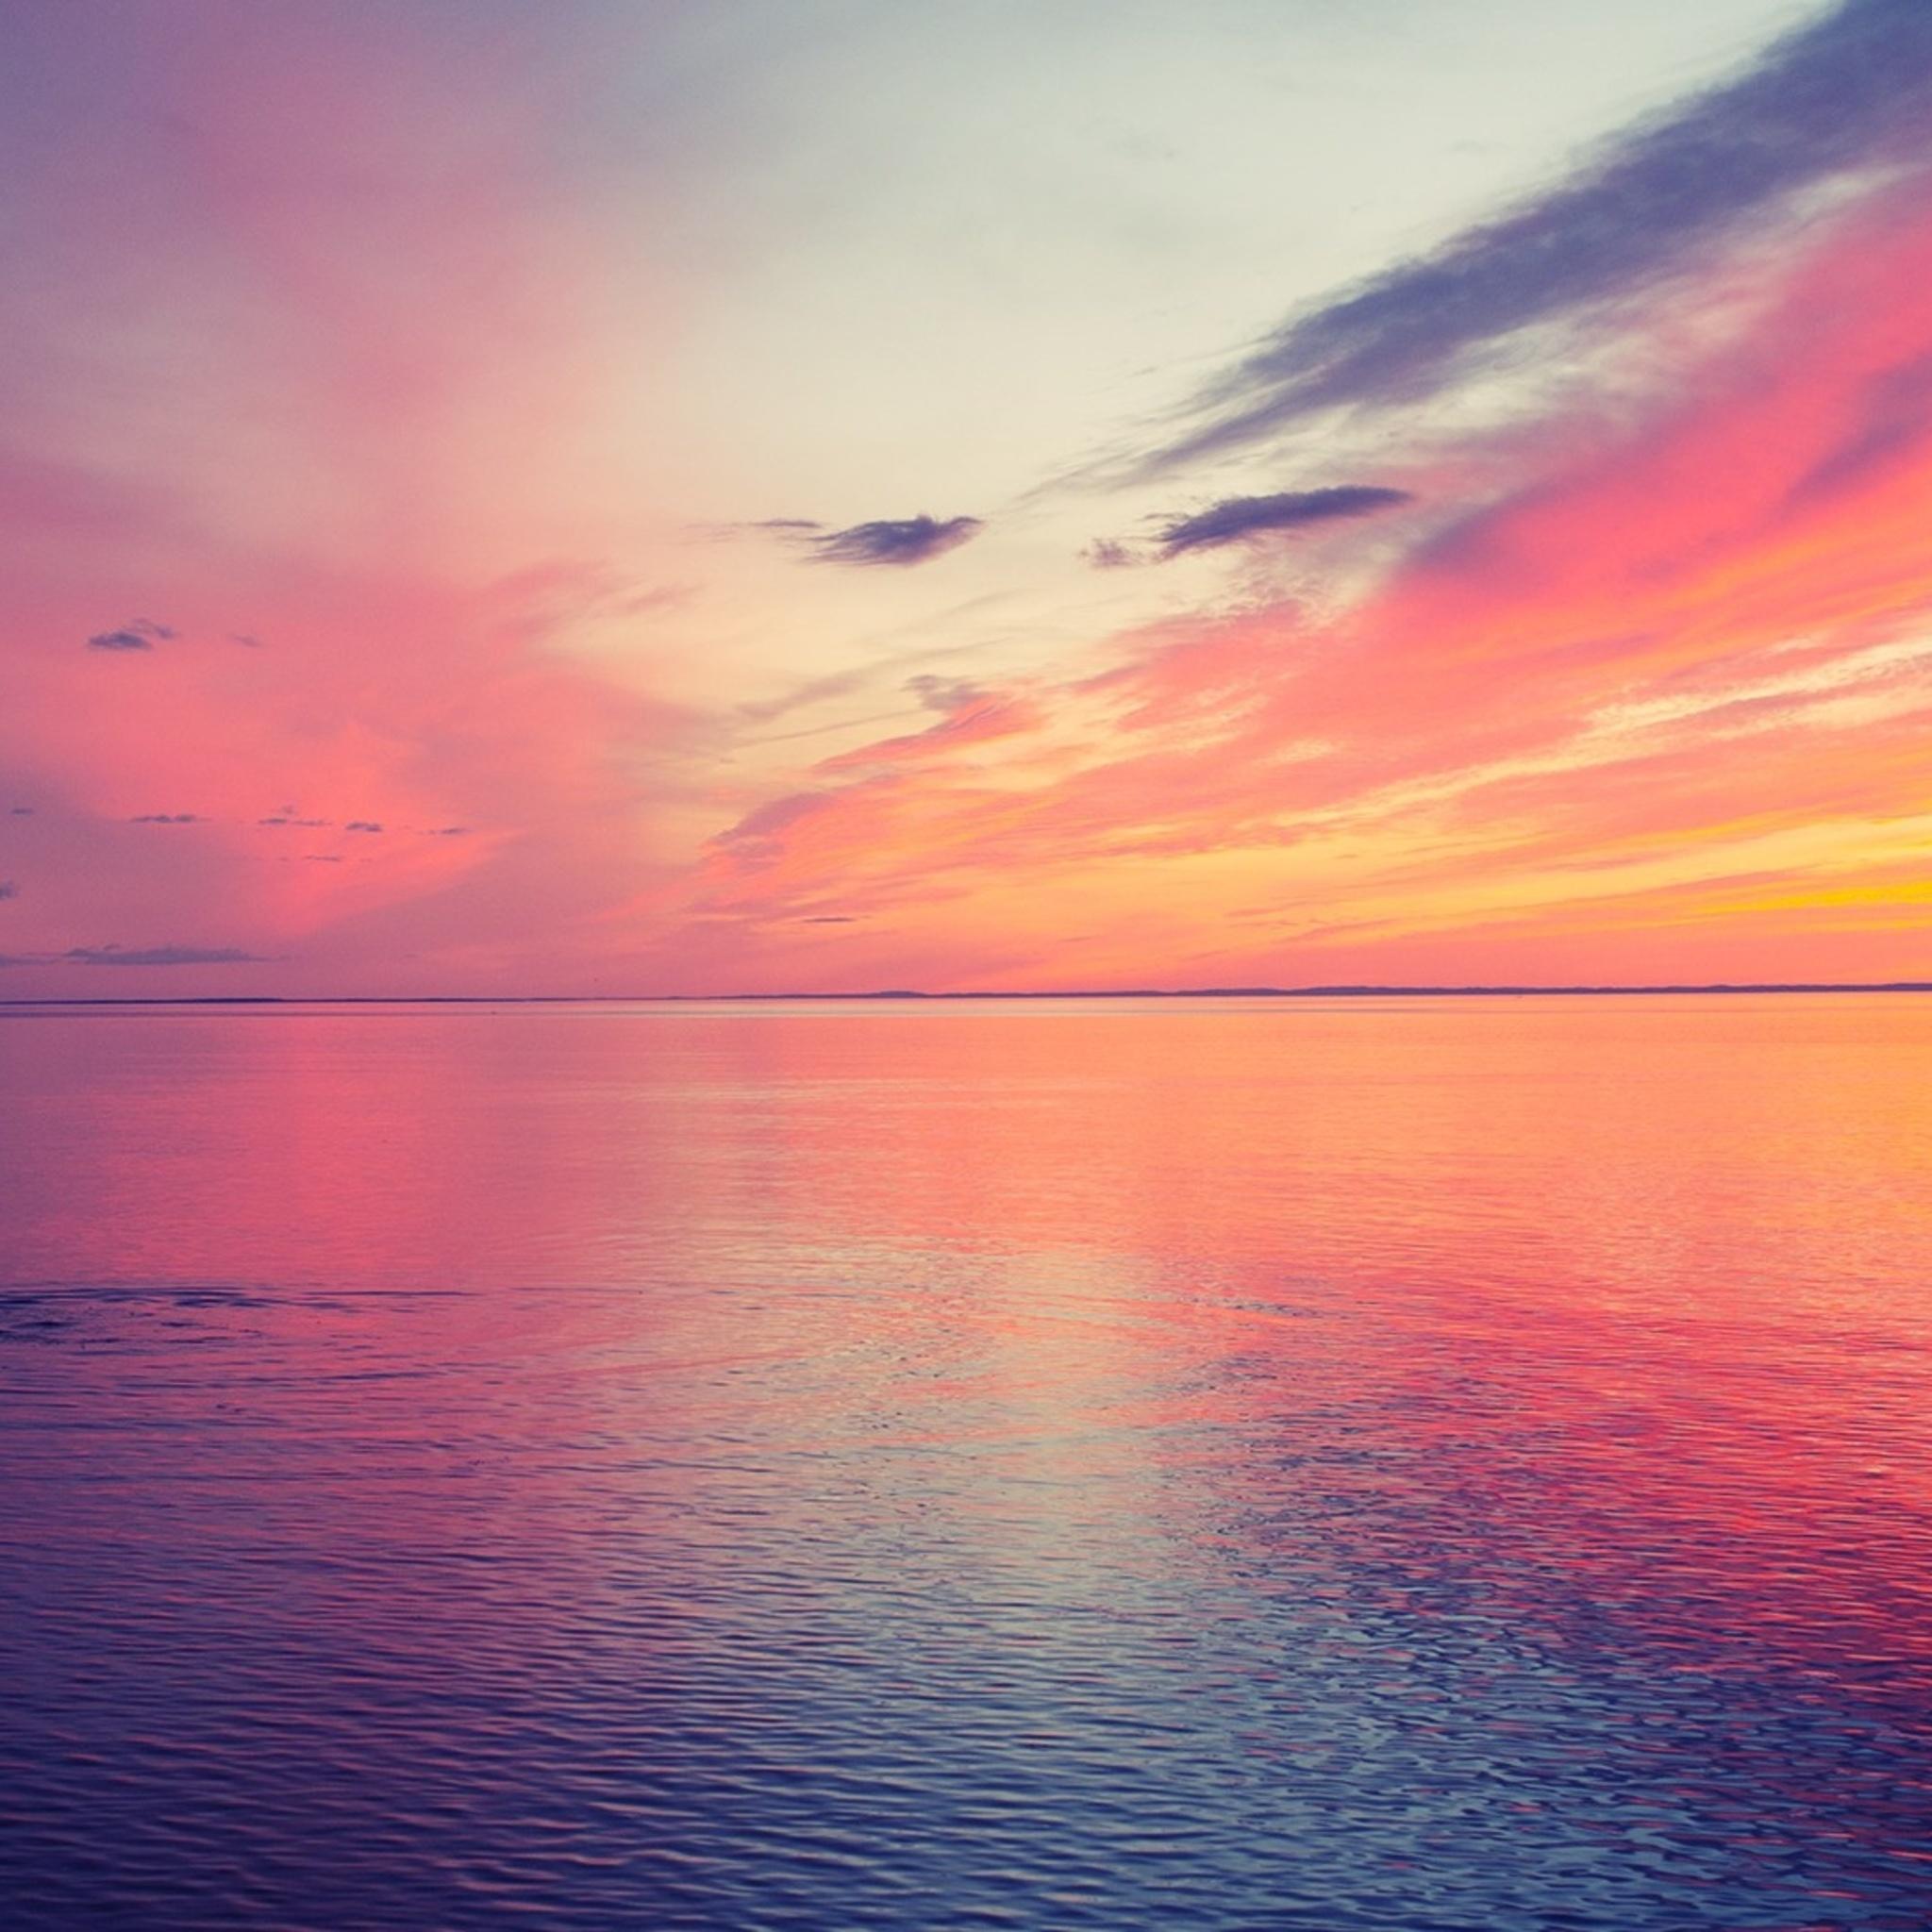 2048x2048 Beautiful Sunset 2 Ipad Air HD 4k Wallpapers